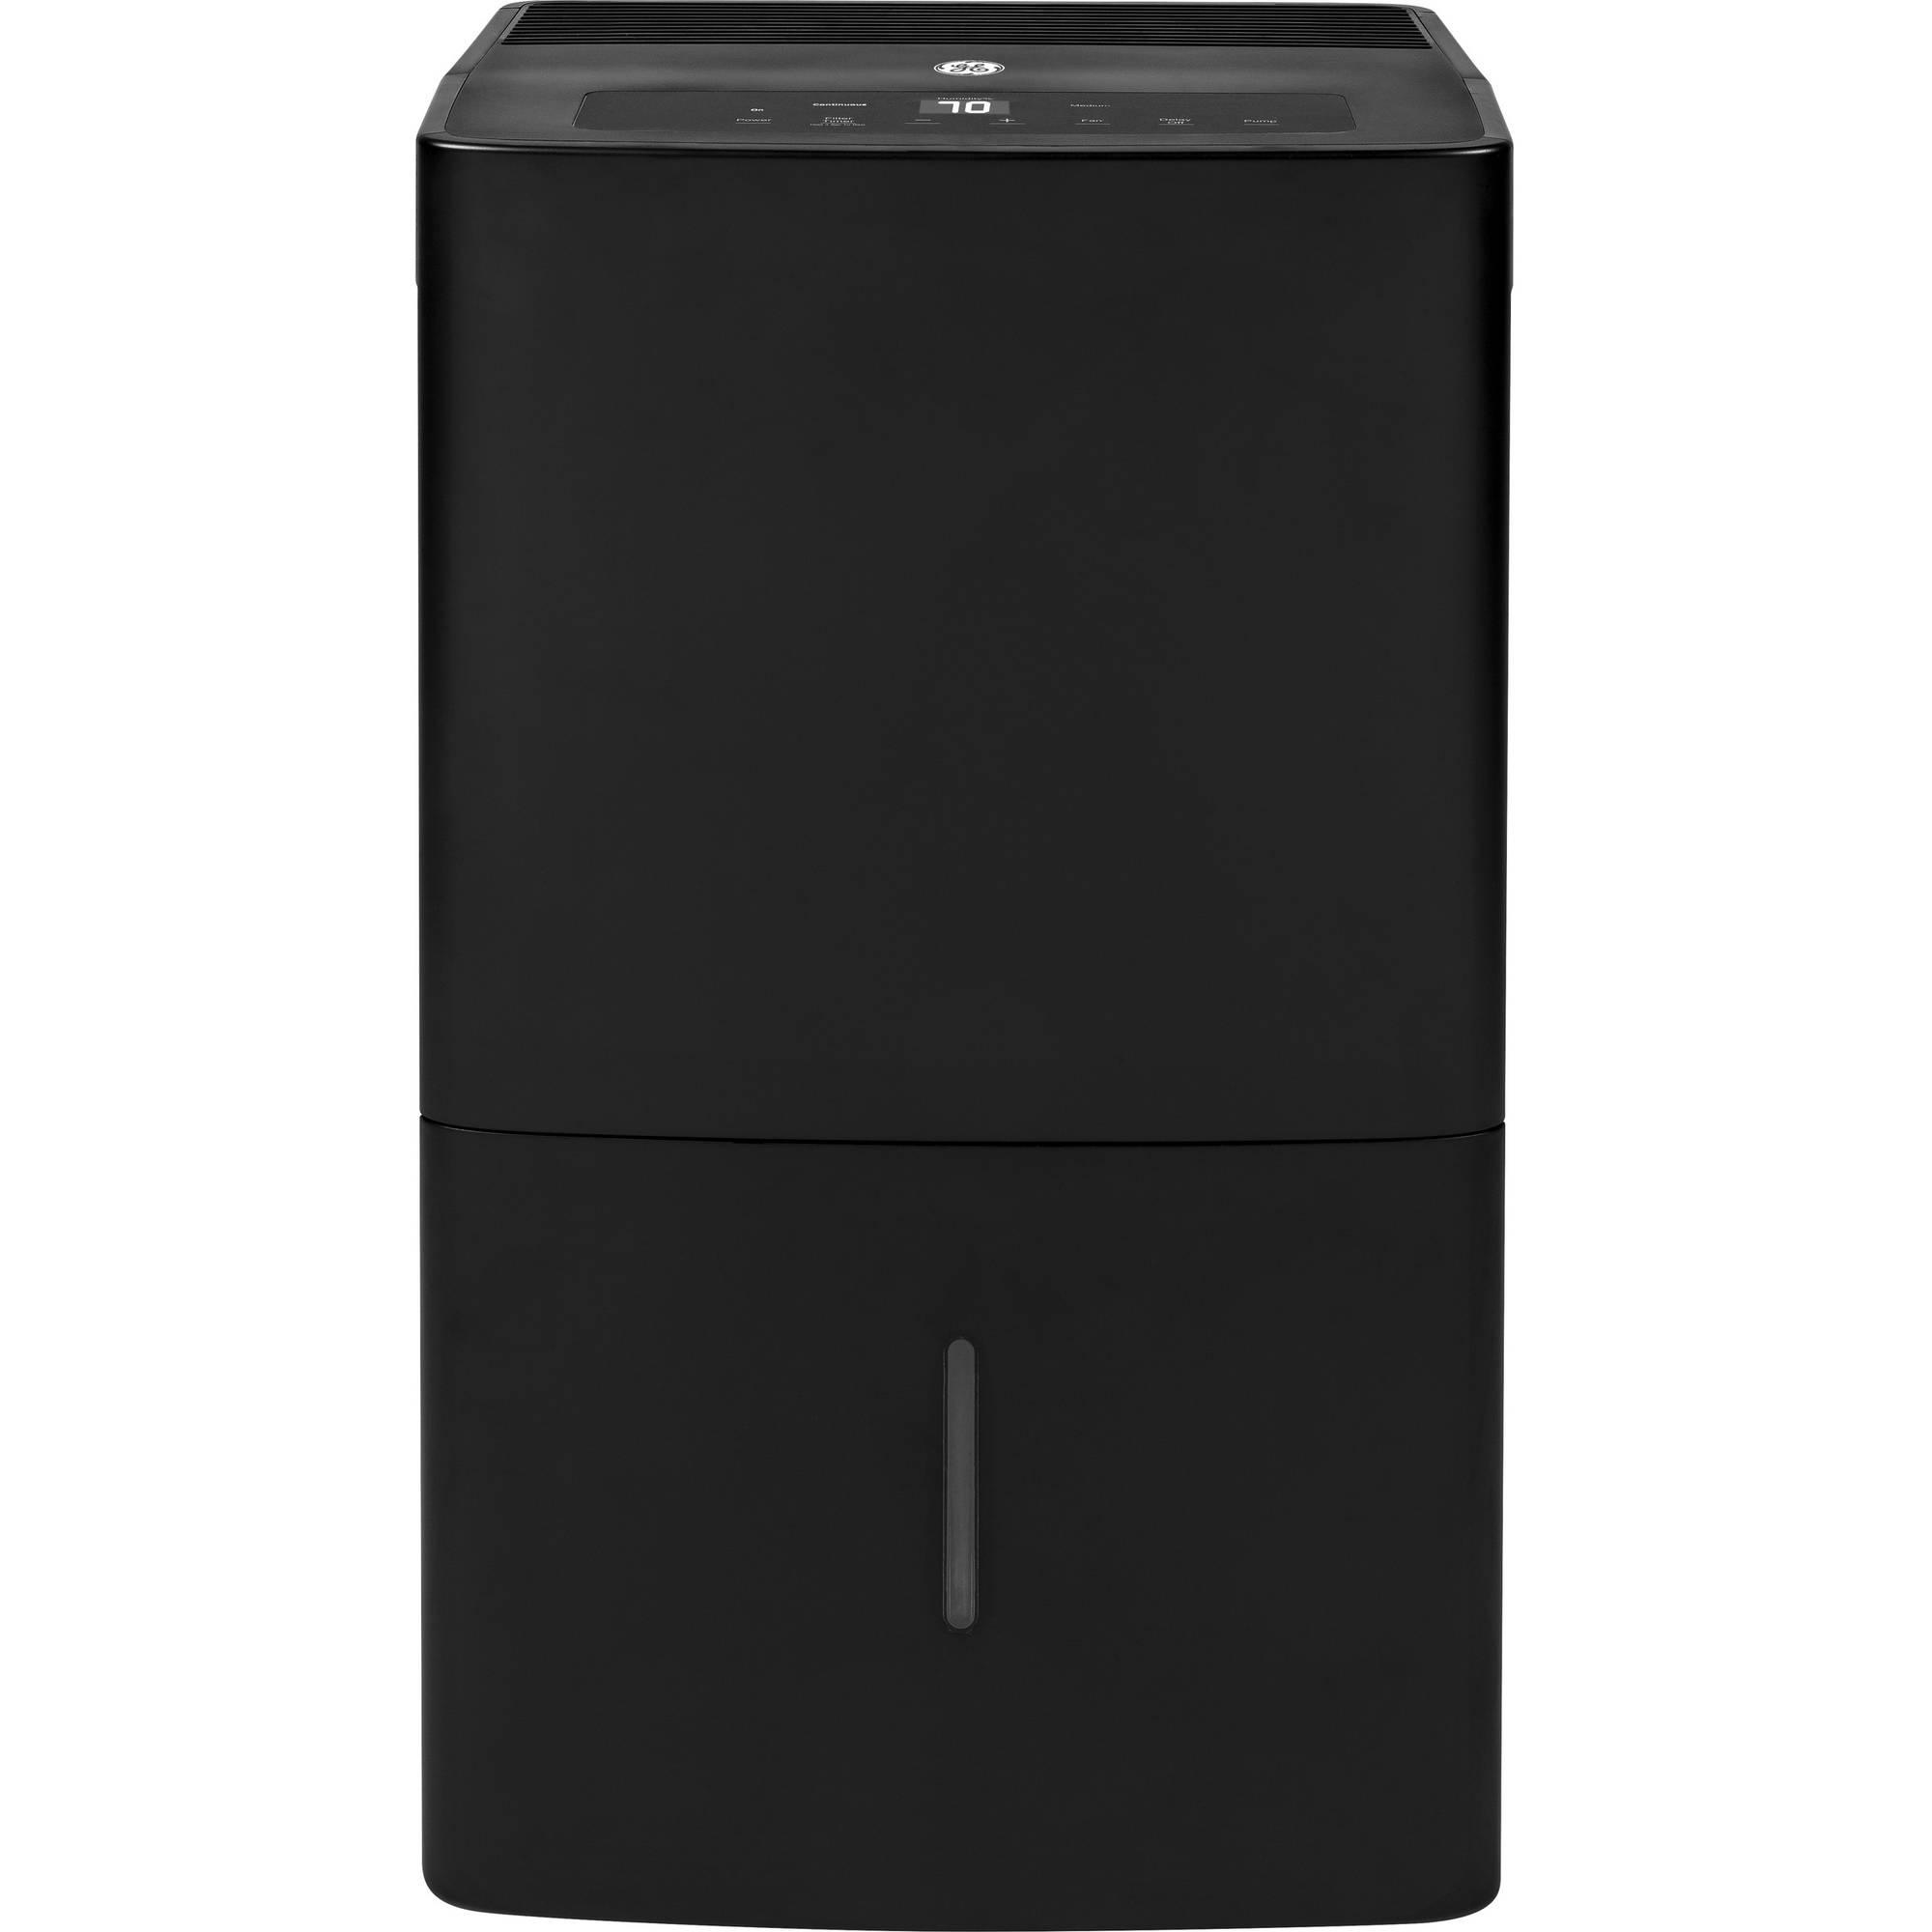 GE Appliances 70-Pint Energy Star Dehumidifier, ADEW70LW, Black